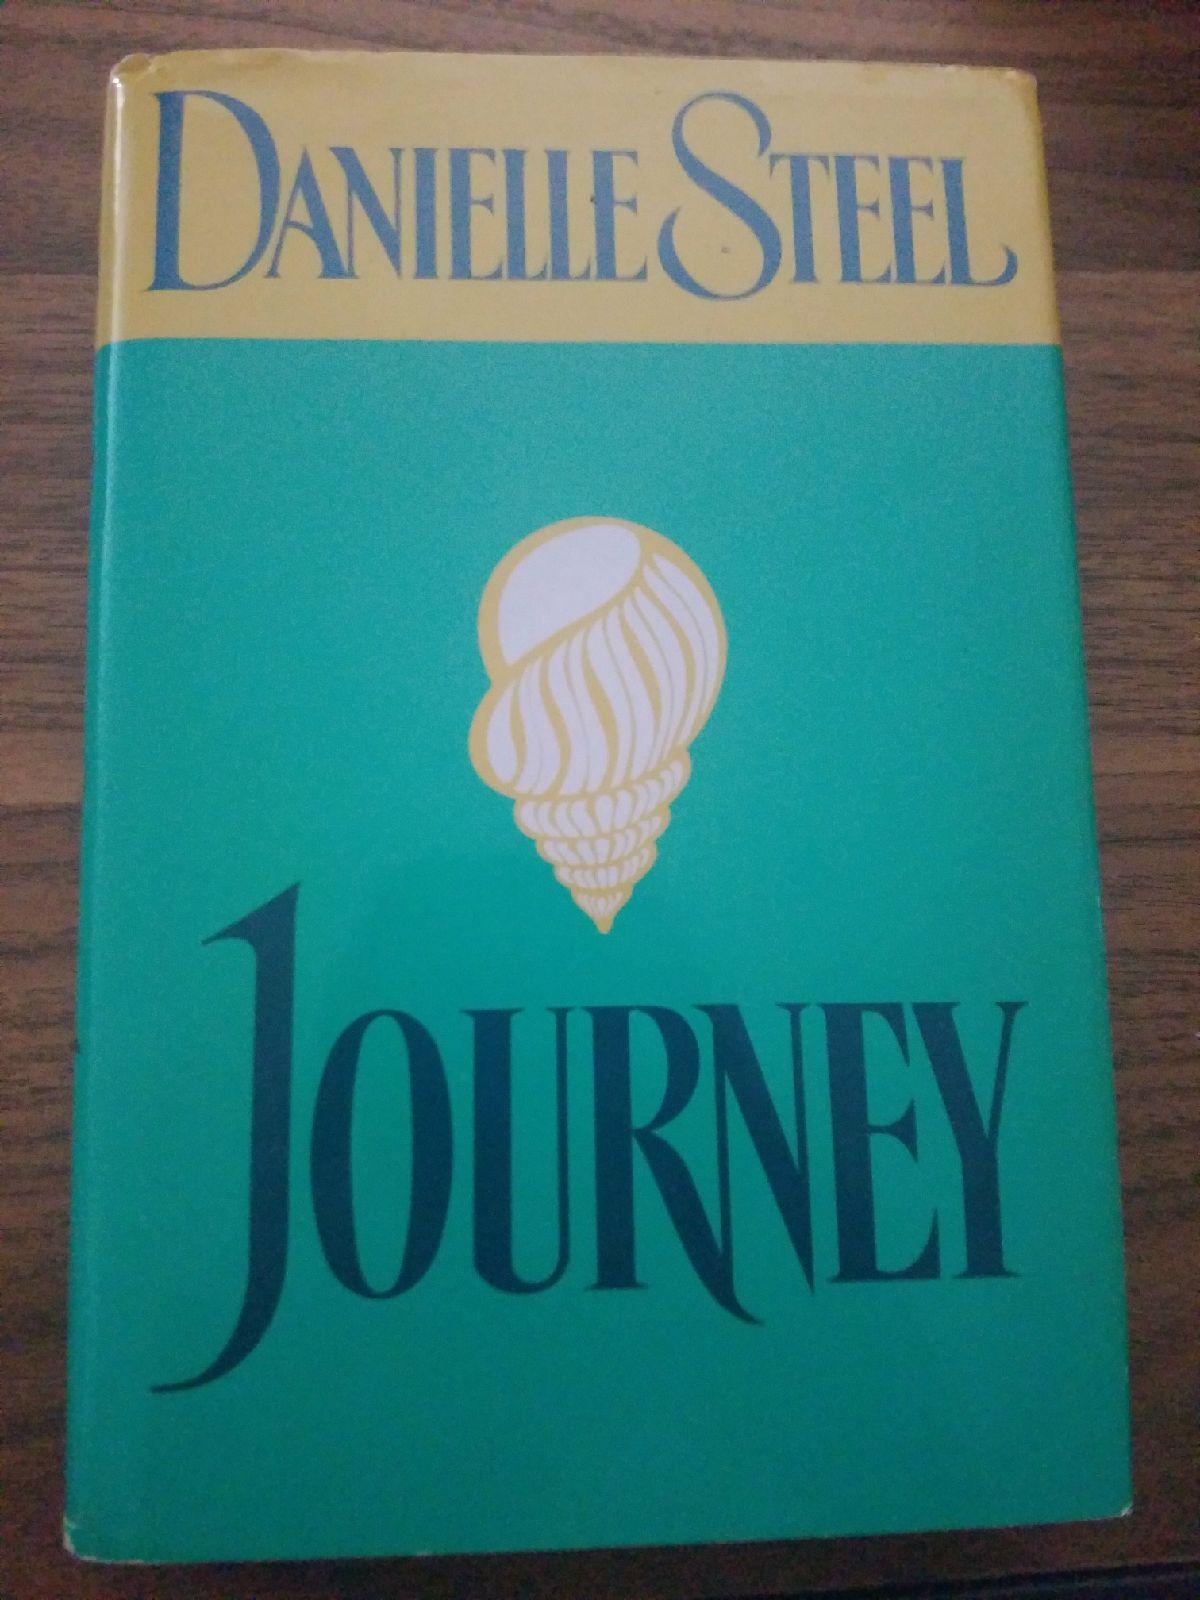 Danielle Steel - Journey (Hardback)